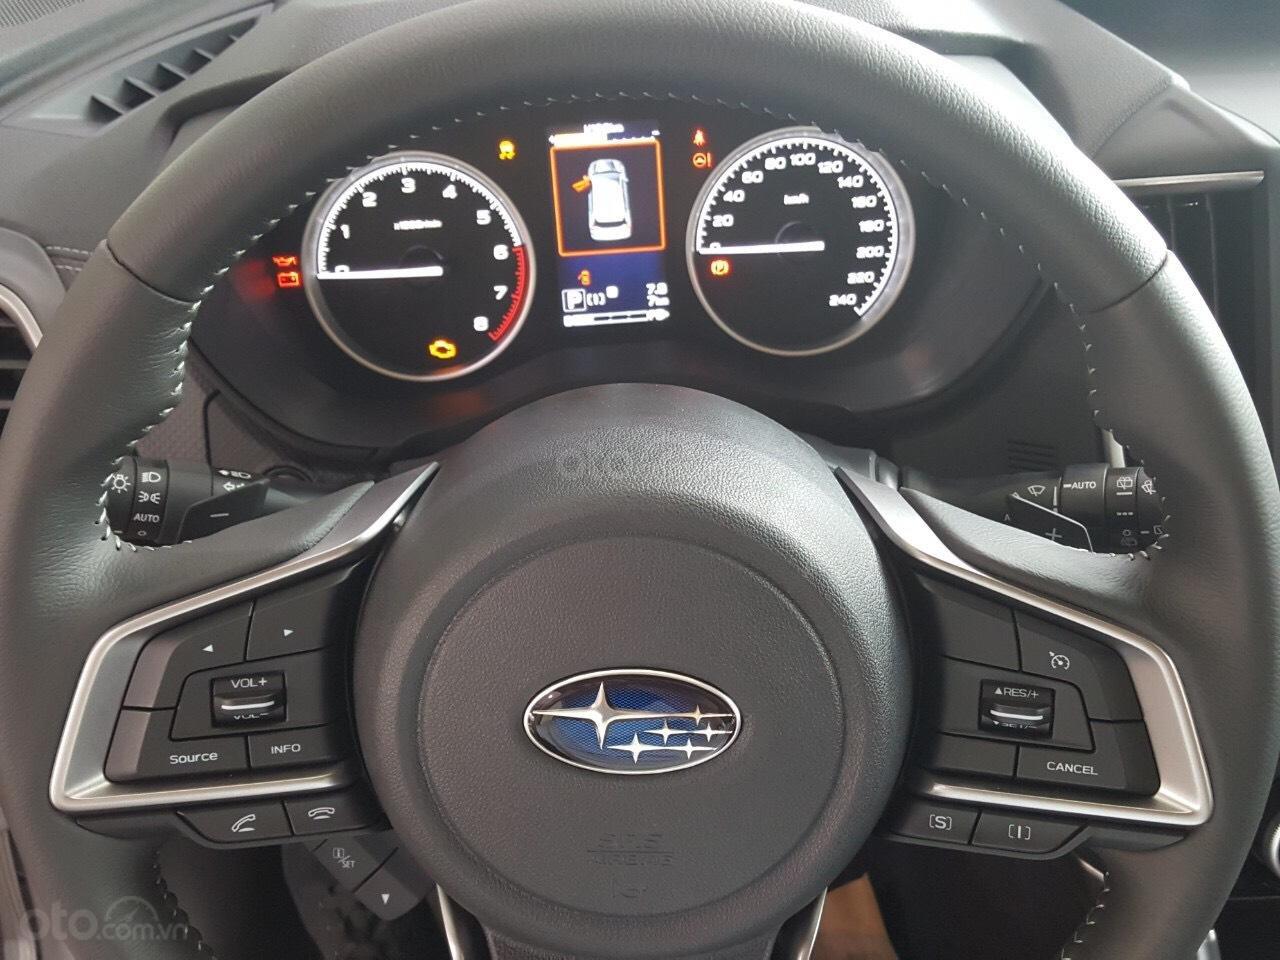 Bán Subaru Forester 2.0 IL, giảm TM trên 100tr, gọi 093.22222.30 Ms Loan (7)